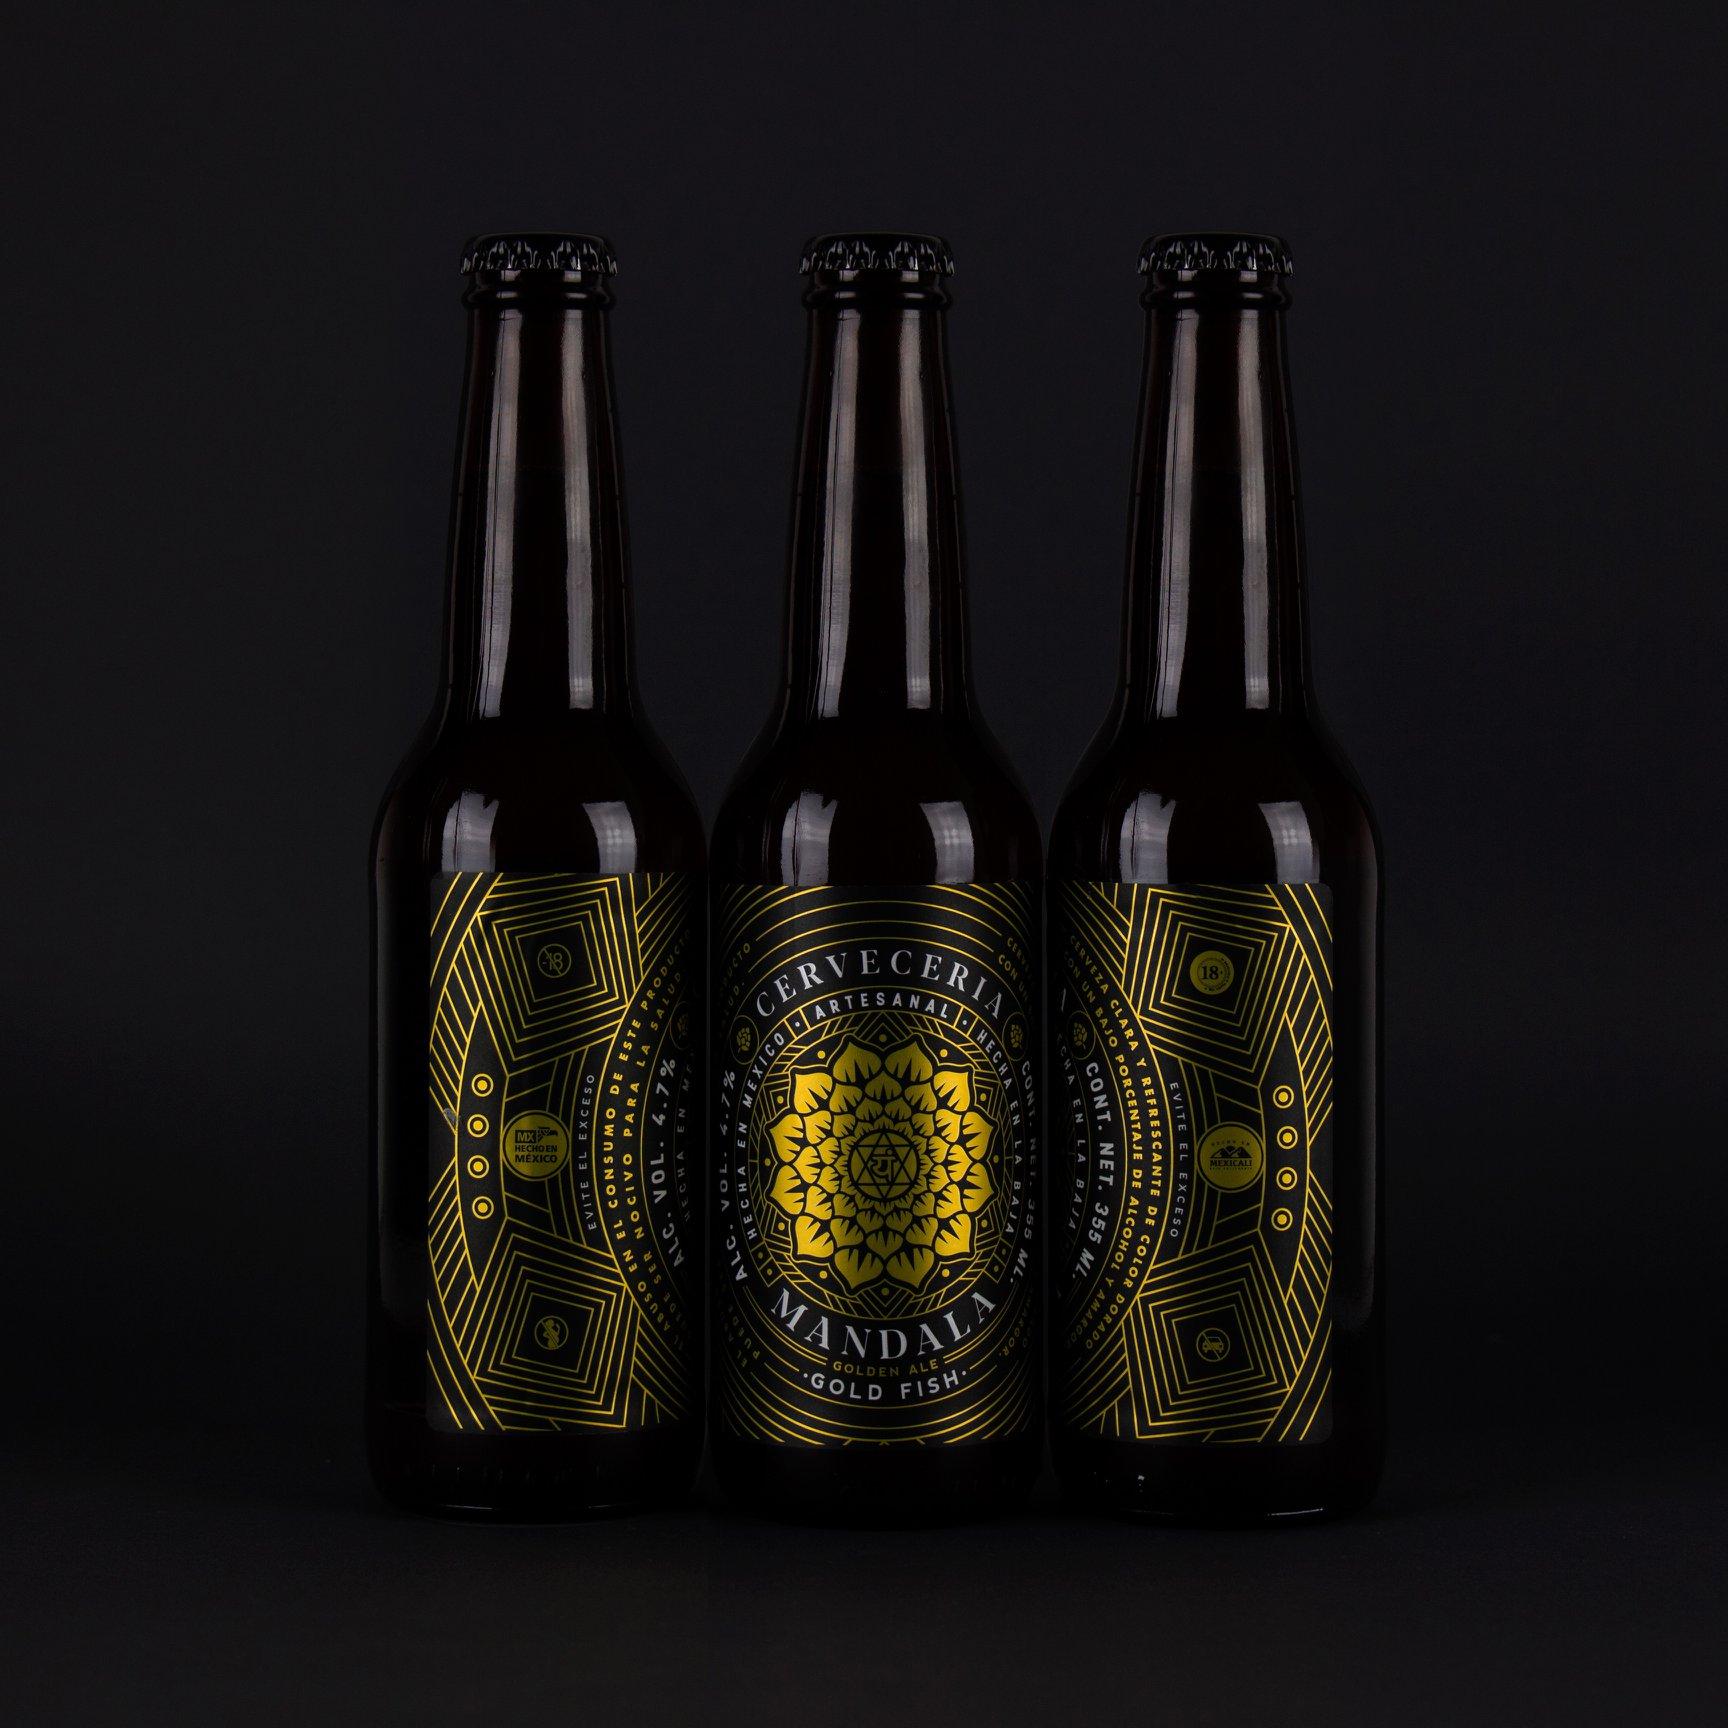 Sideralmx Design Studio - Beer Mandala5.jpg